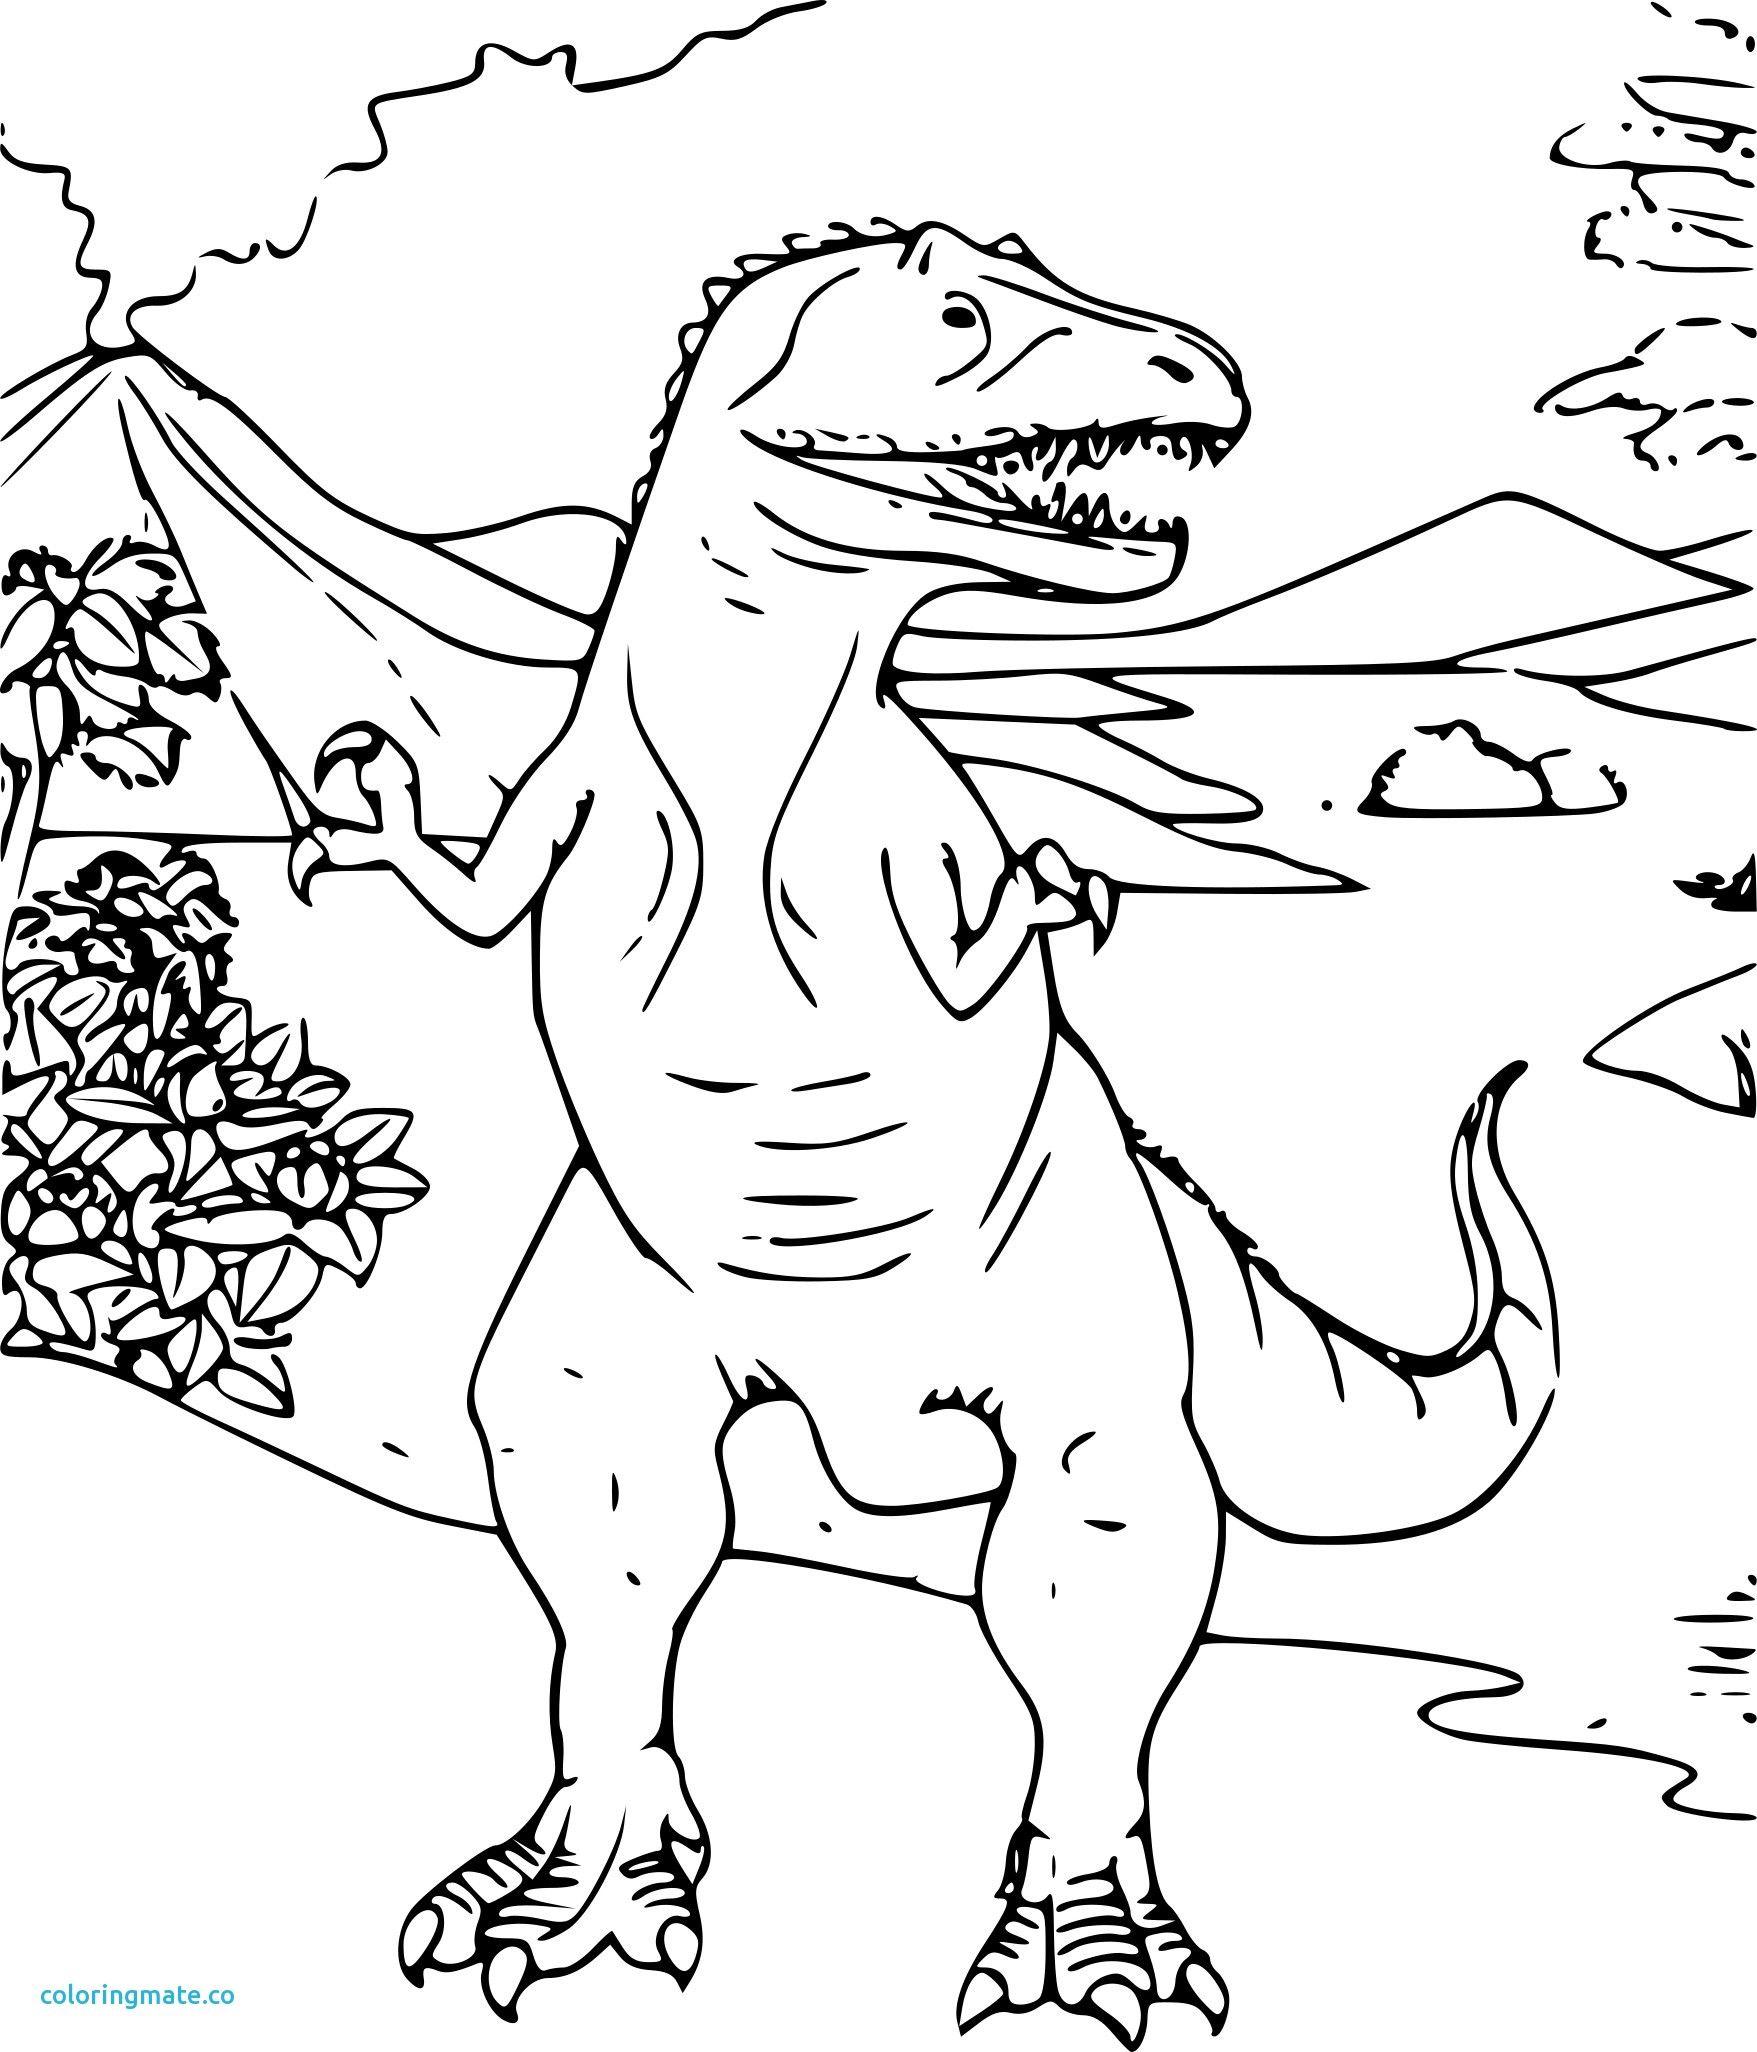 Coloriage dinosaure tyrannosaure a imprimer sur coloriages info of coloriage mandala dinosaure - Coloriage a imprimer dinosaure ...